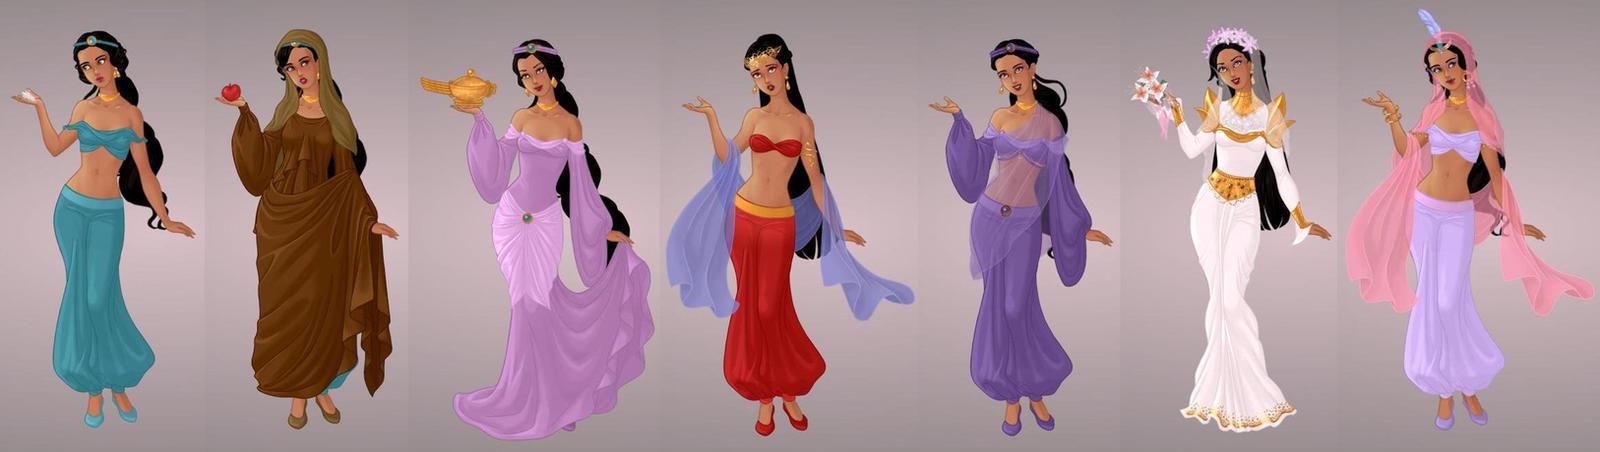 Jasmine Wardrobe in Goddess Scene by autumnrose83